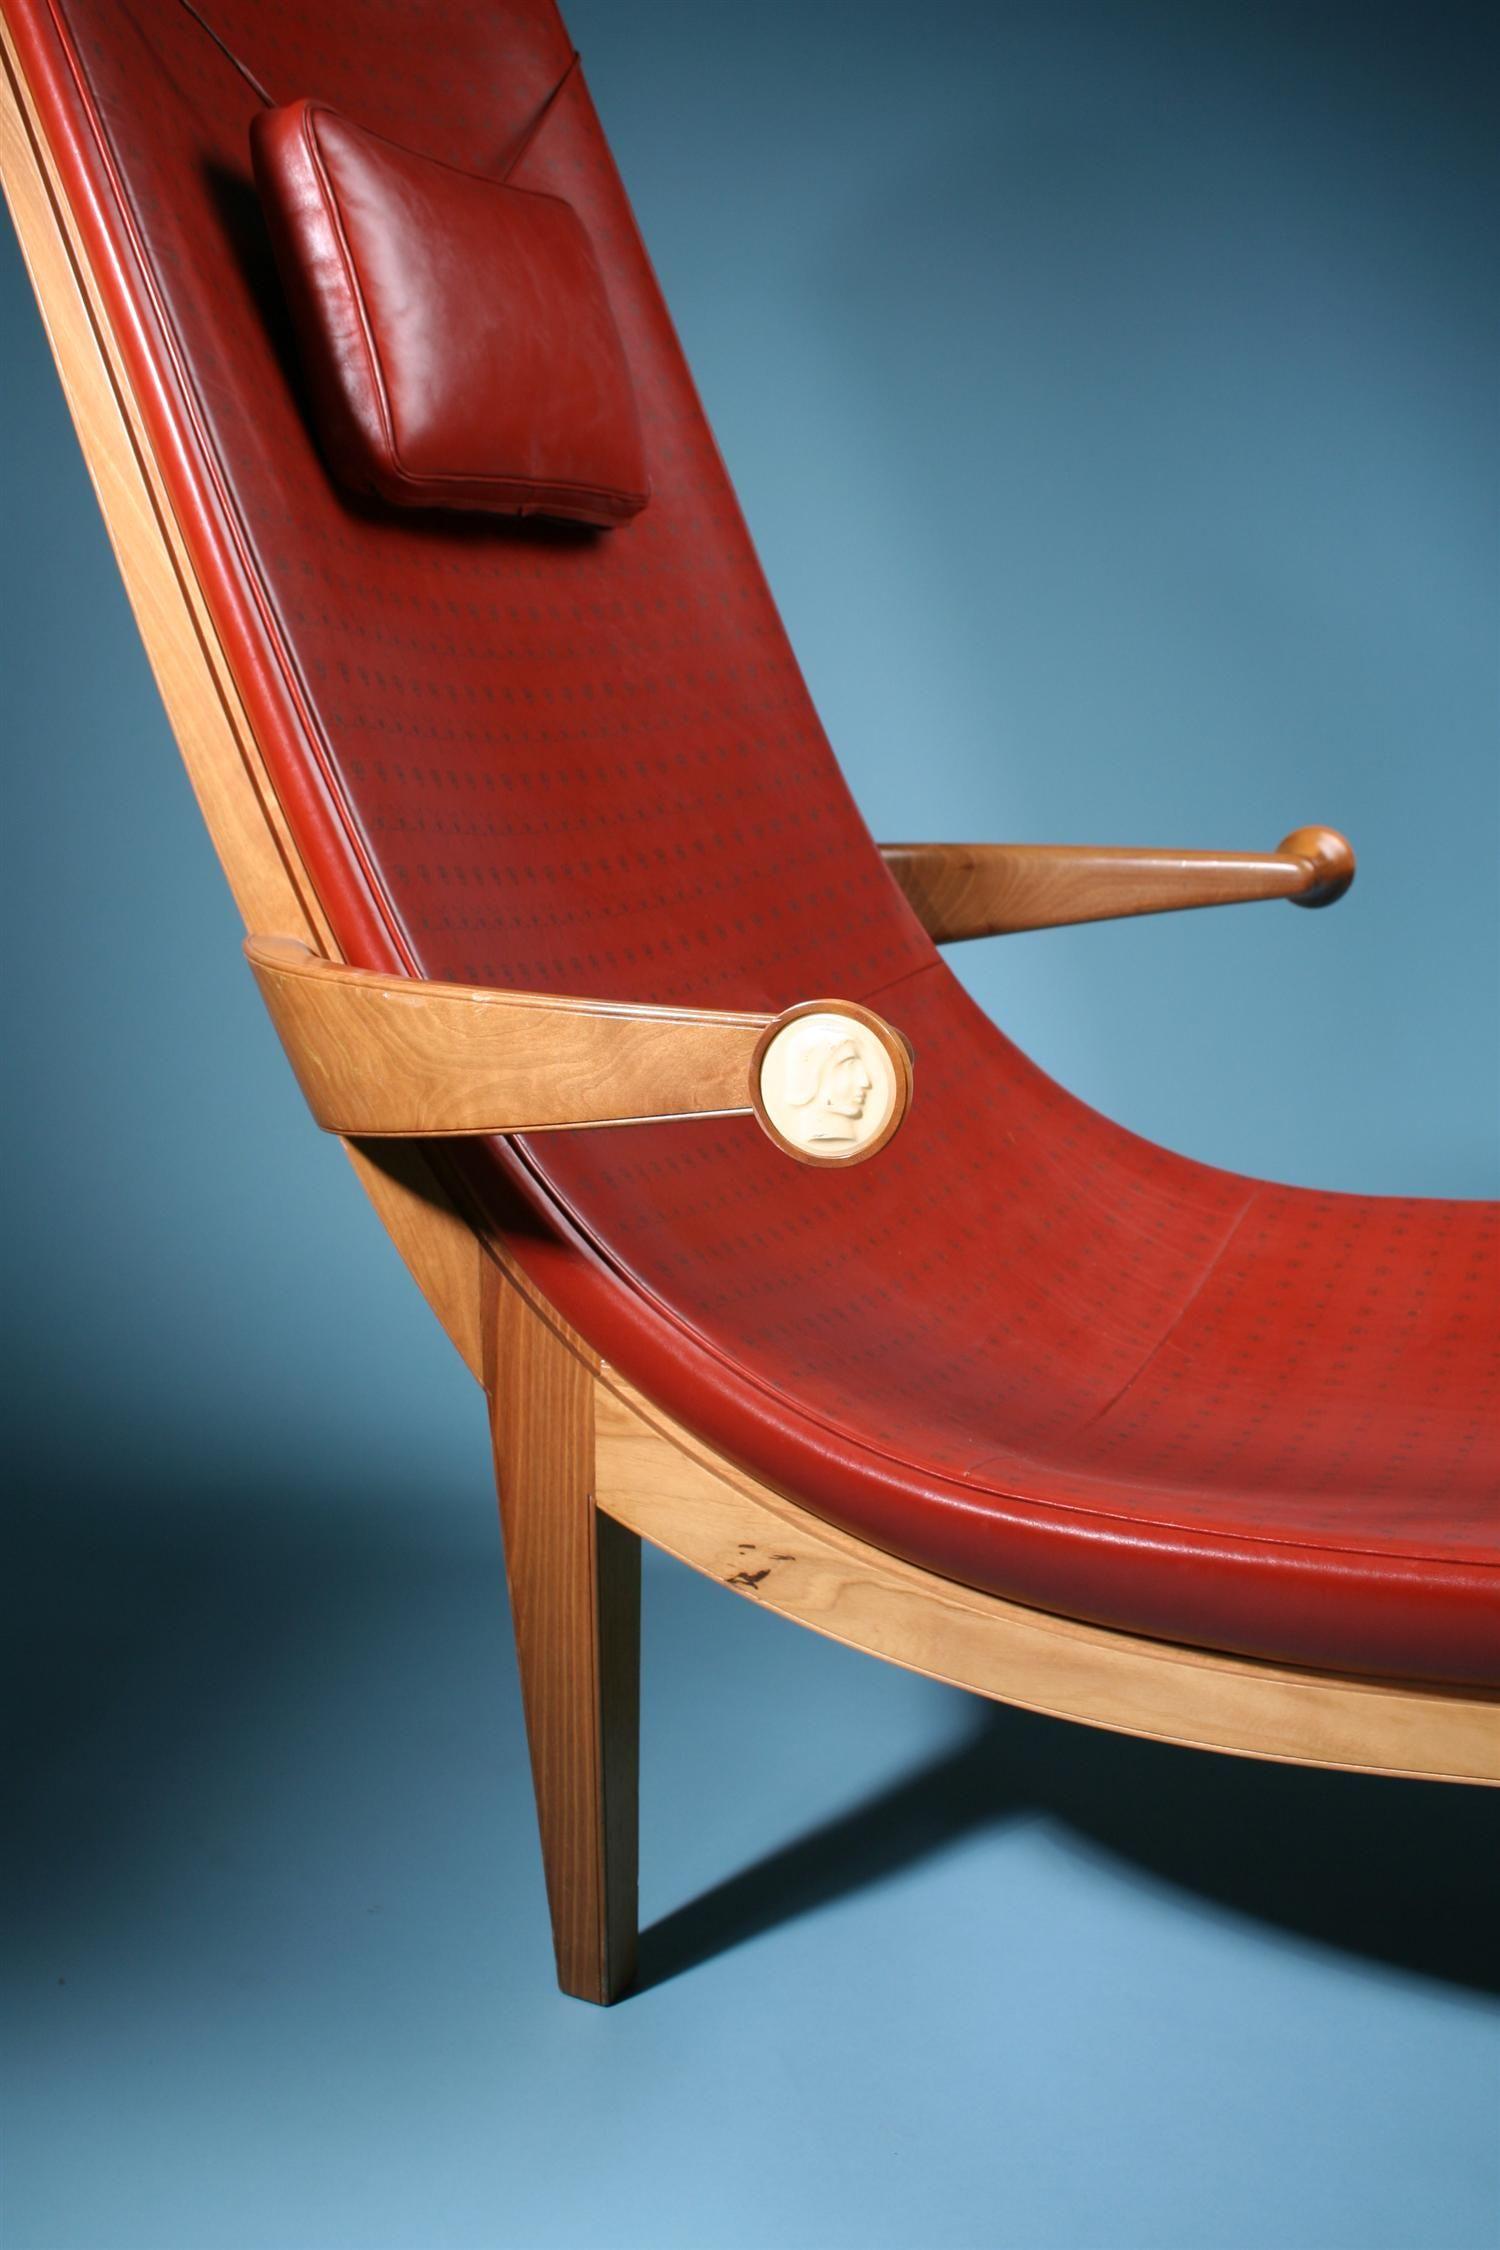 Erik gunnar asplund (swedish, 1885–1940): interior for paris ...